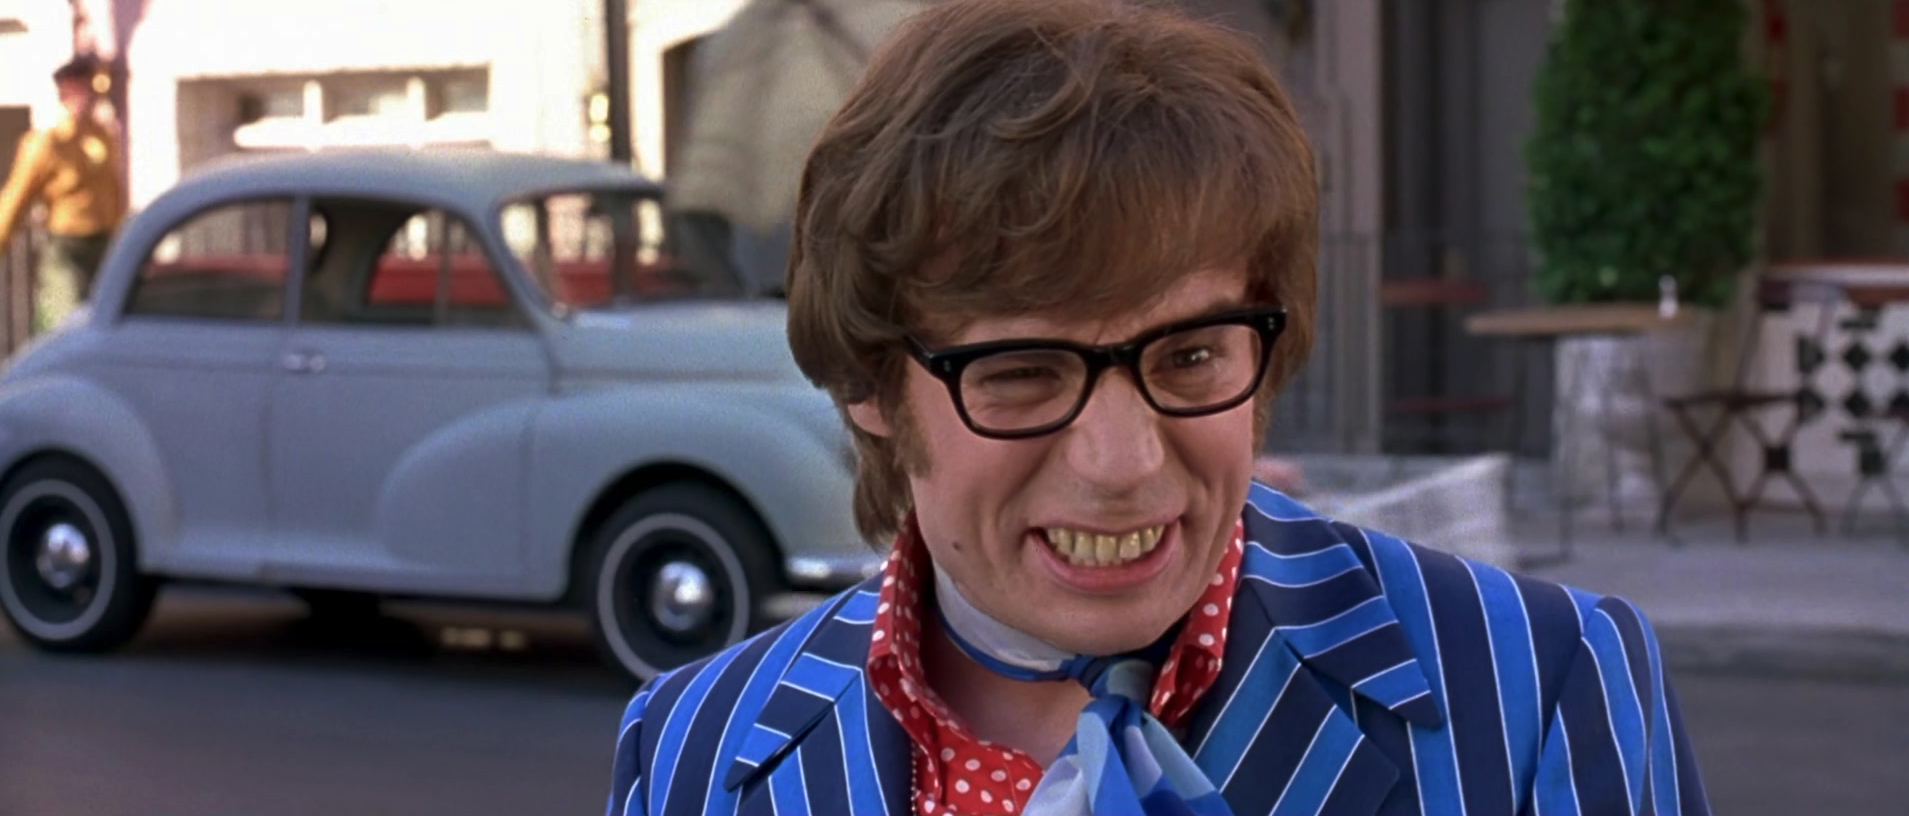 Austin Powers smiling